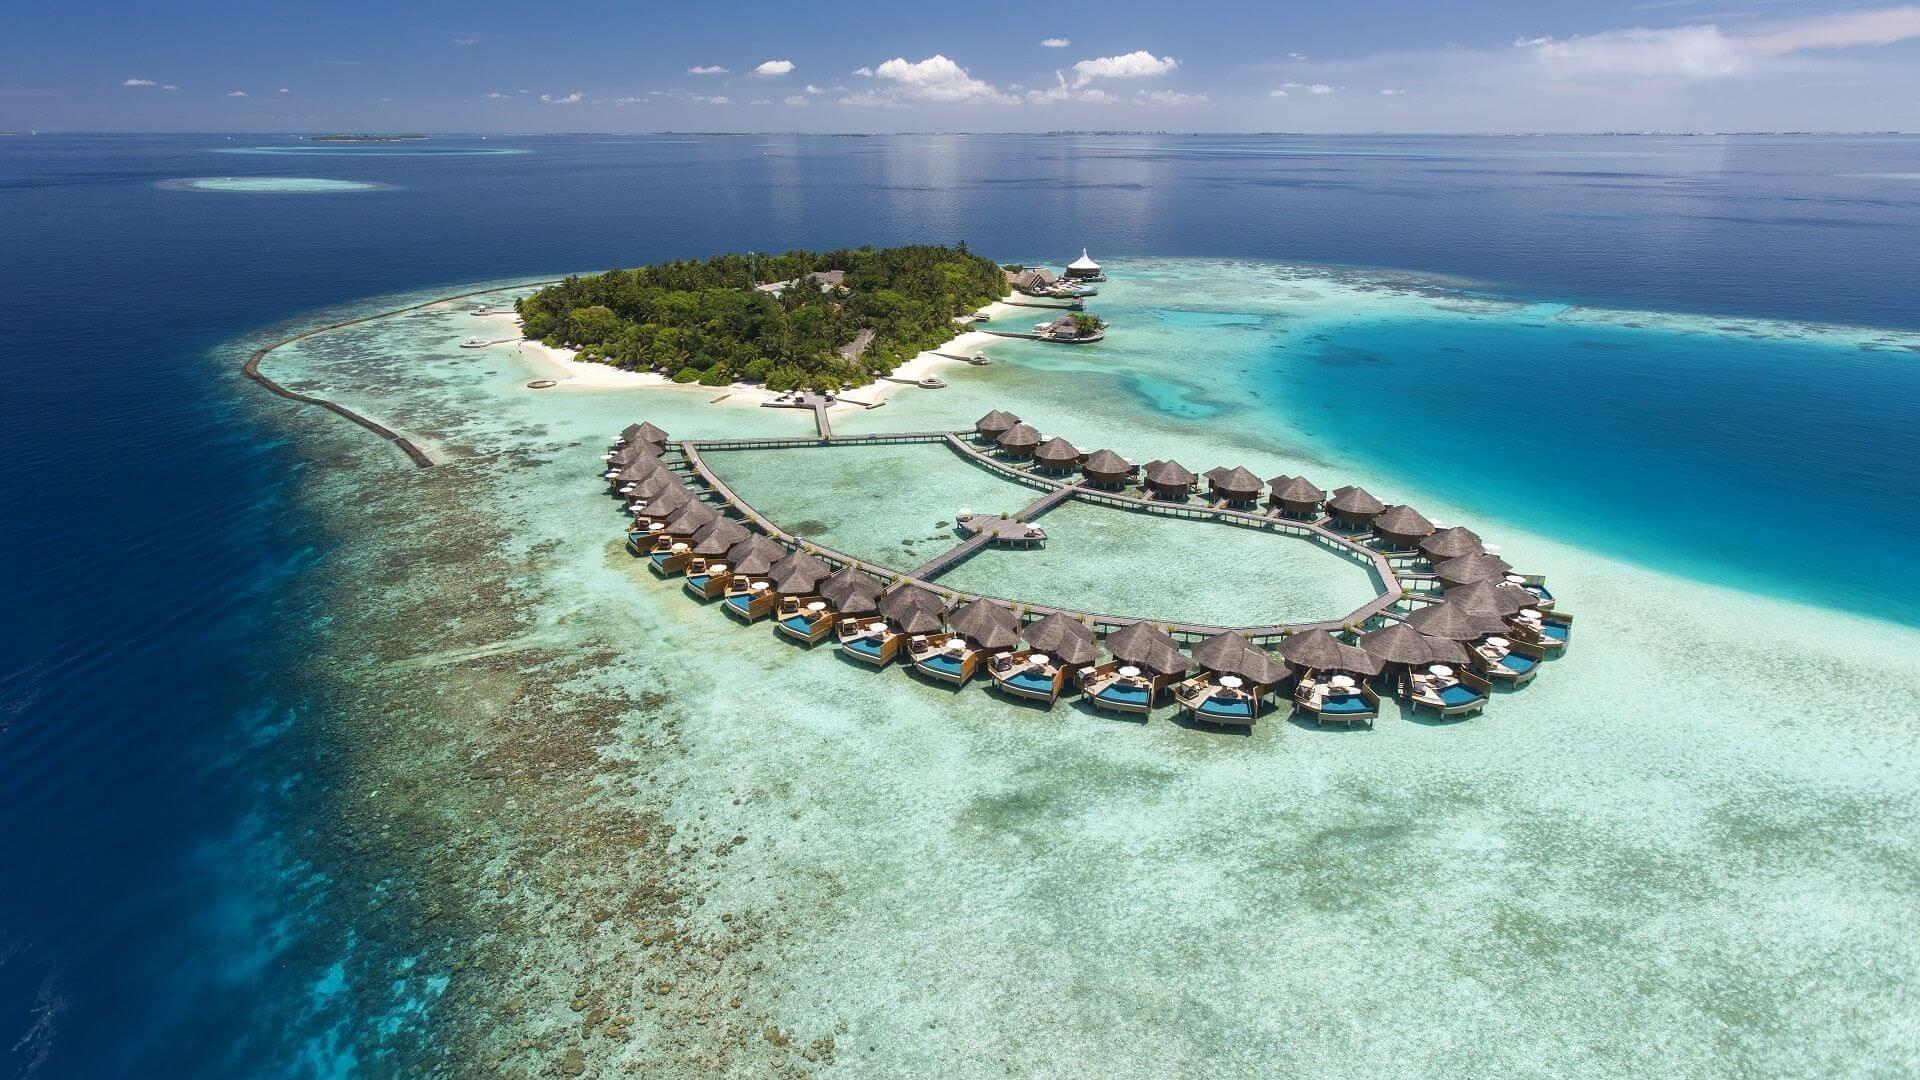 #Baros Maldives #BarosIsland #Asia #Maldives #Hotels #travel #travelblogger #travelgram #travelguide #travels #travelling #travelblog #traveladdict #traveladikkt #beautifuldestinations #bucketlist #luxury #luxurylifestyle #luxurytravel #luxurydestinations #lifestyle #lifestyleblogger #beautifulplaces #beautifulplace #beautiful #beautifuldestination